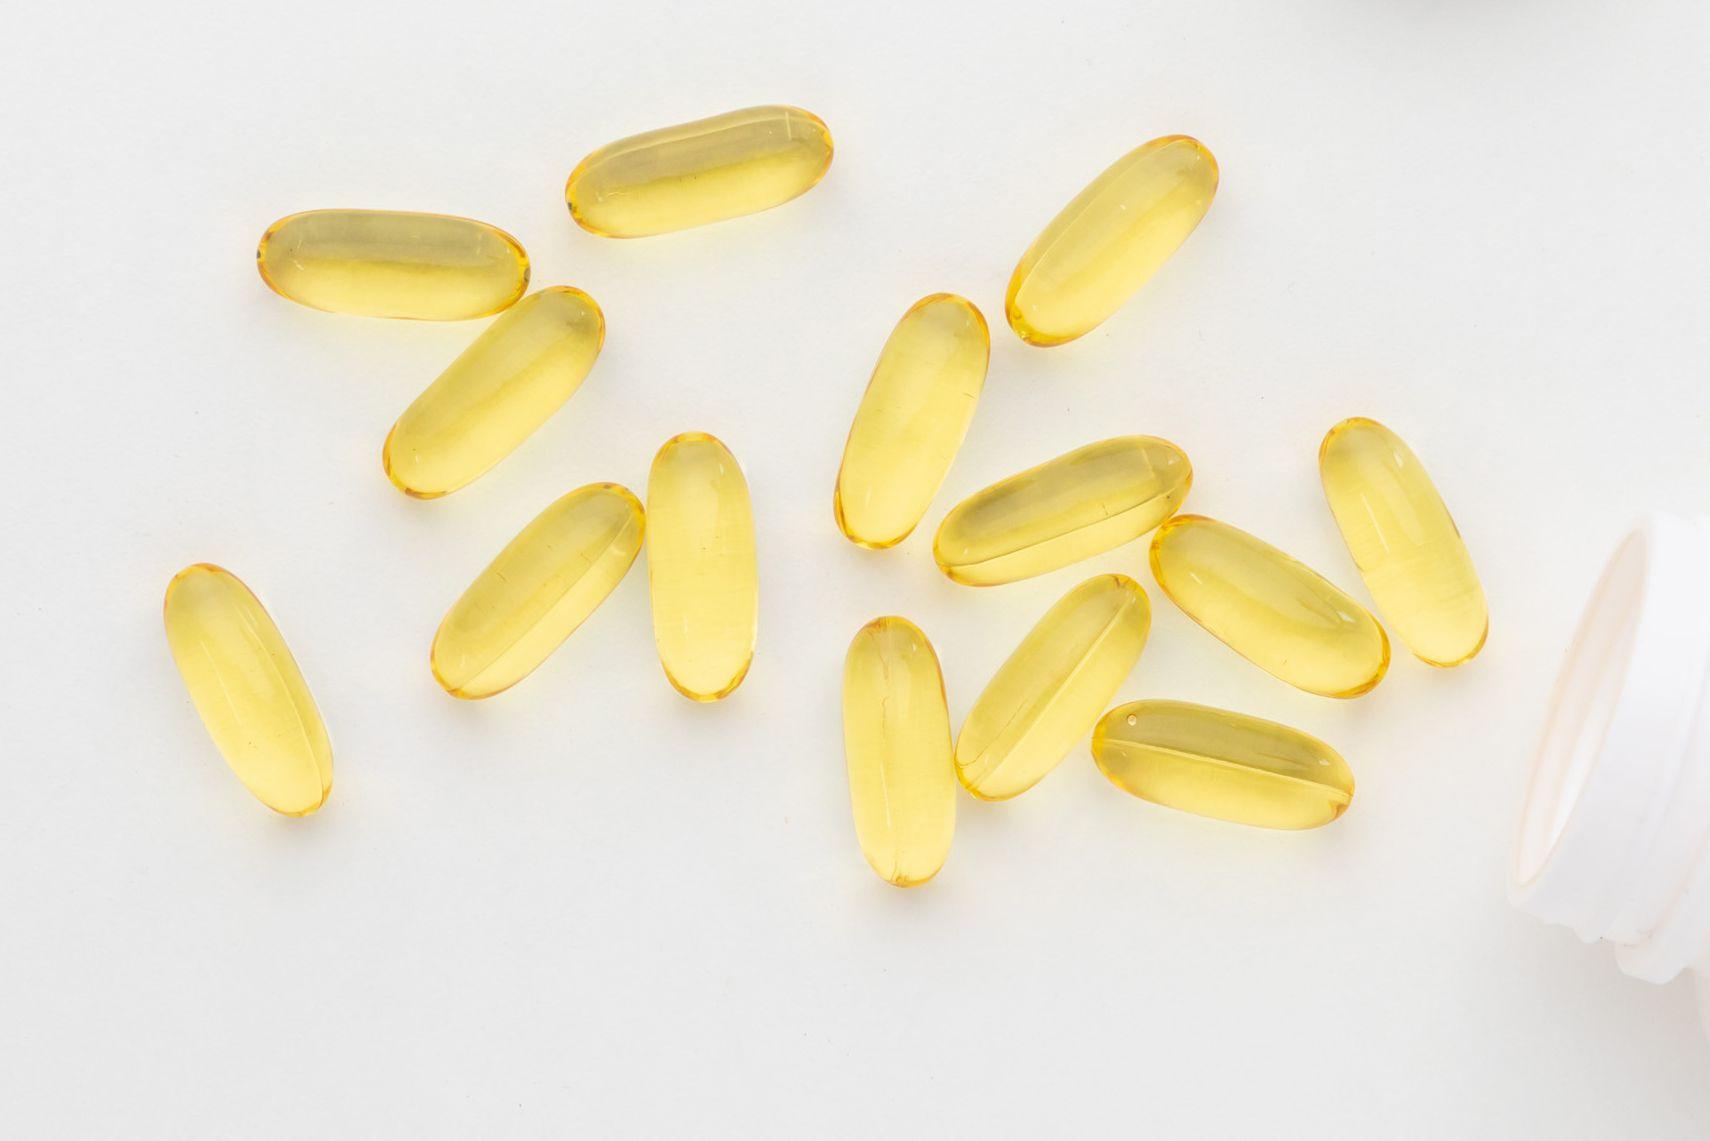 Primrose oil soft gels